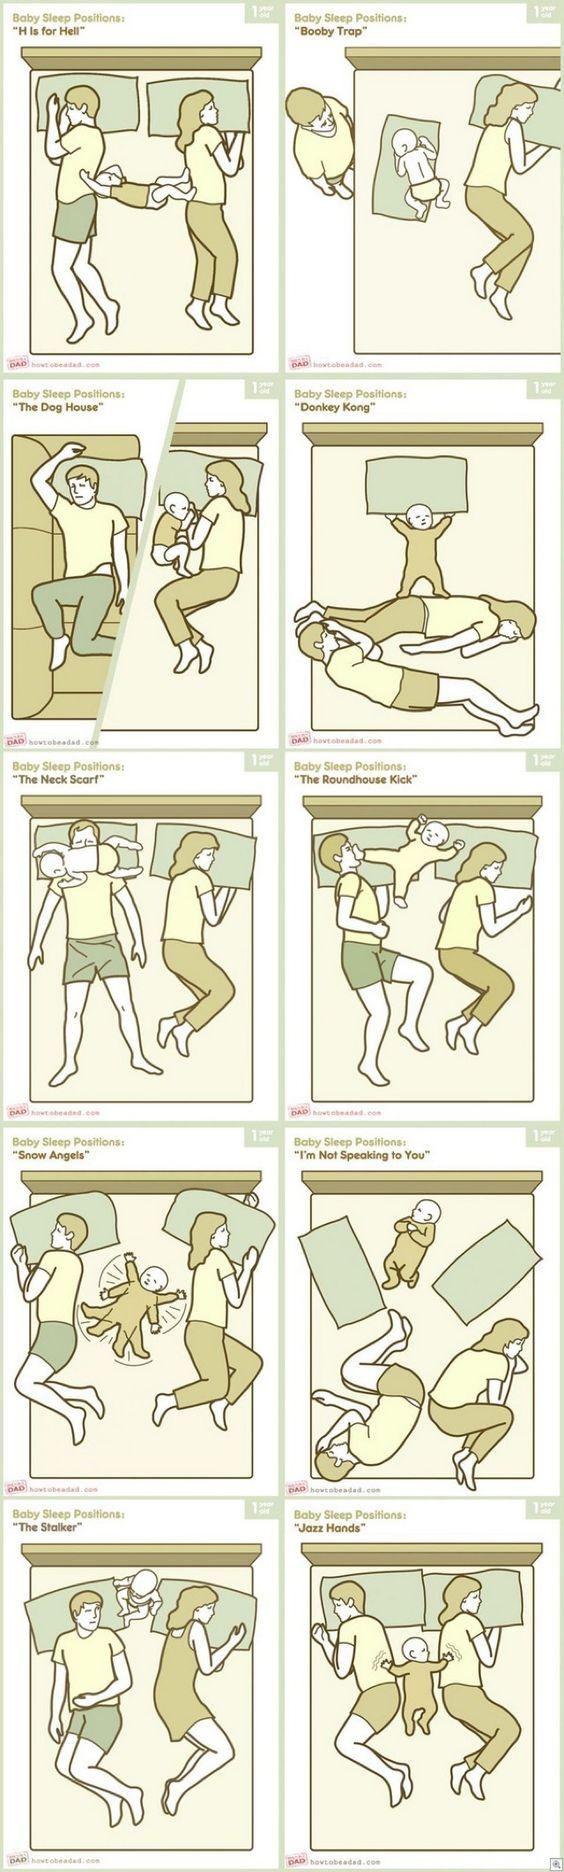 Baby Sleep Position....so true